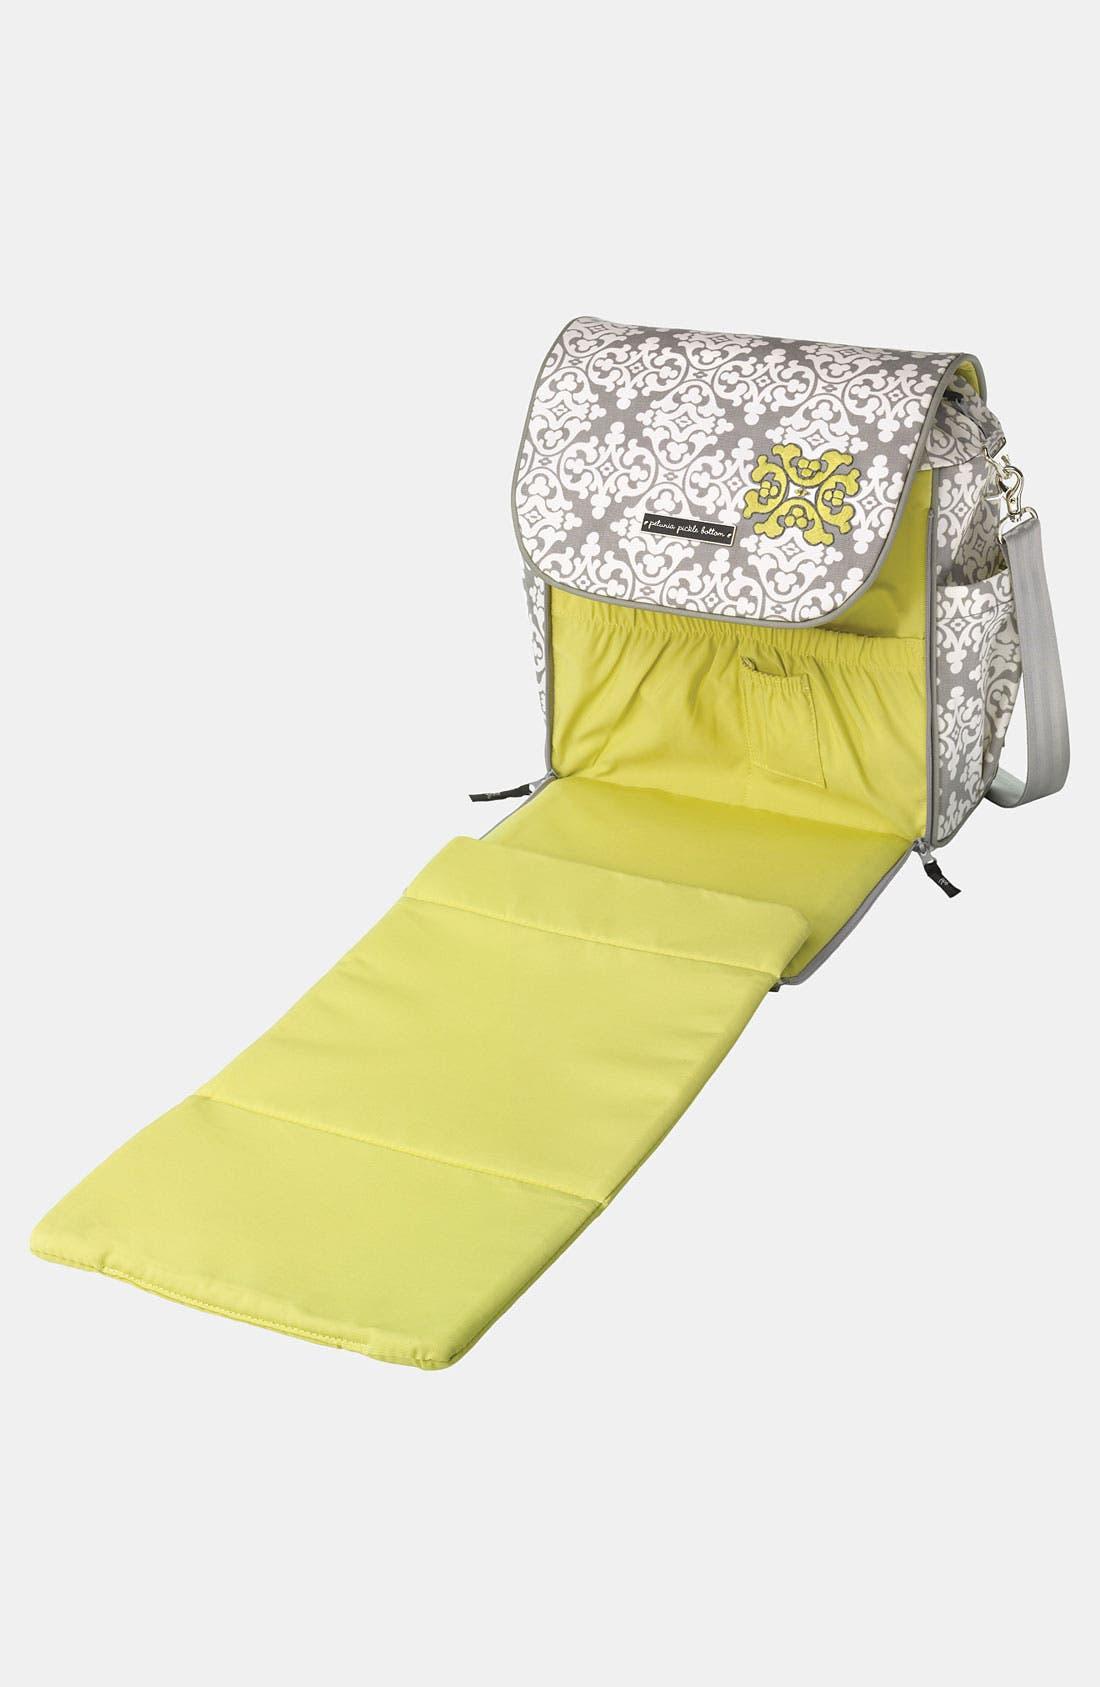 Alternate Image 3  - Petunia Pickle Bottom 'Boxy Glazed' Backpack Diaper Bag